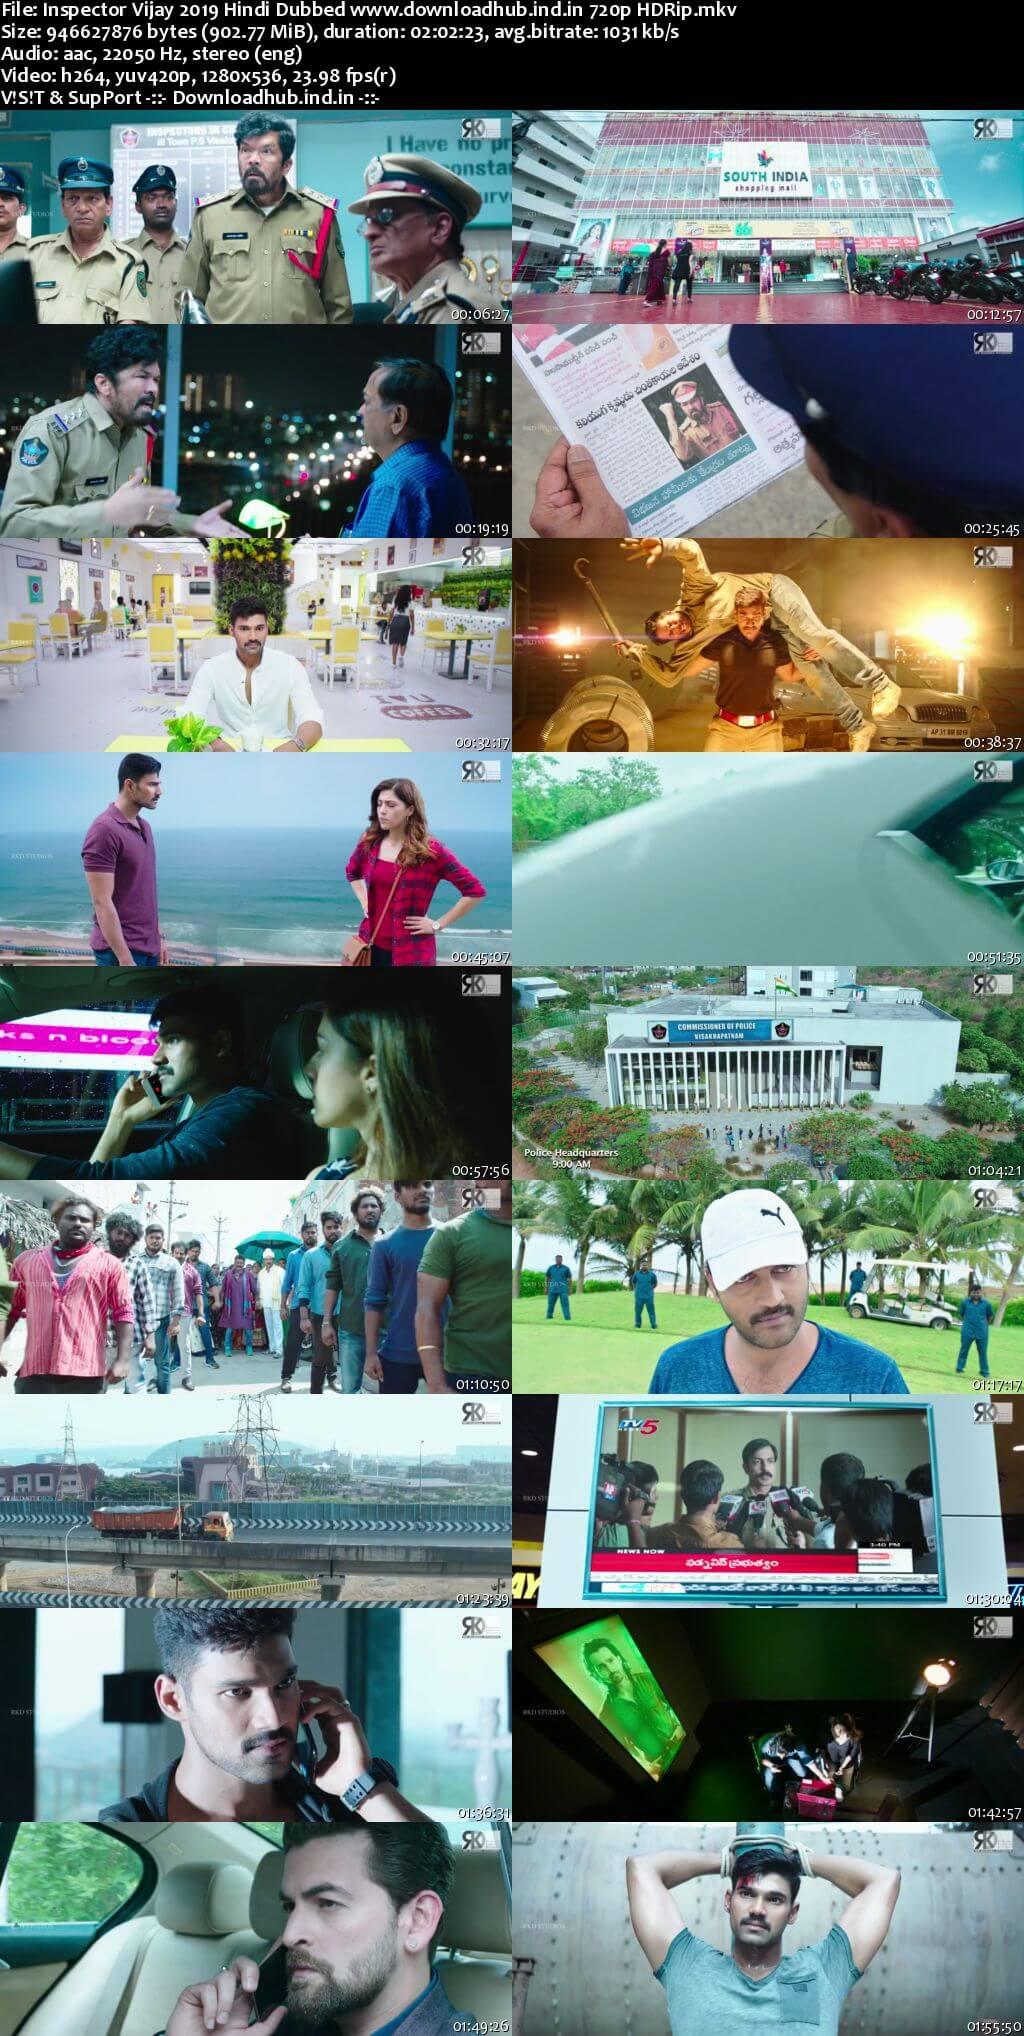 Inspector Vijay 2019 Hindi Dubbed 720p HDRip x264